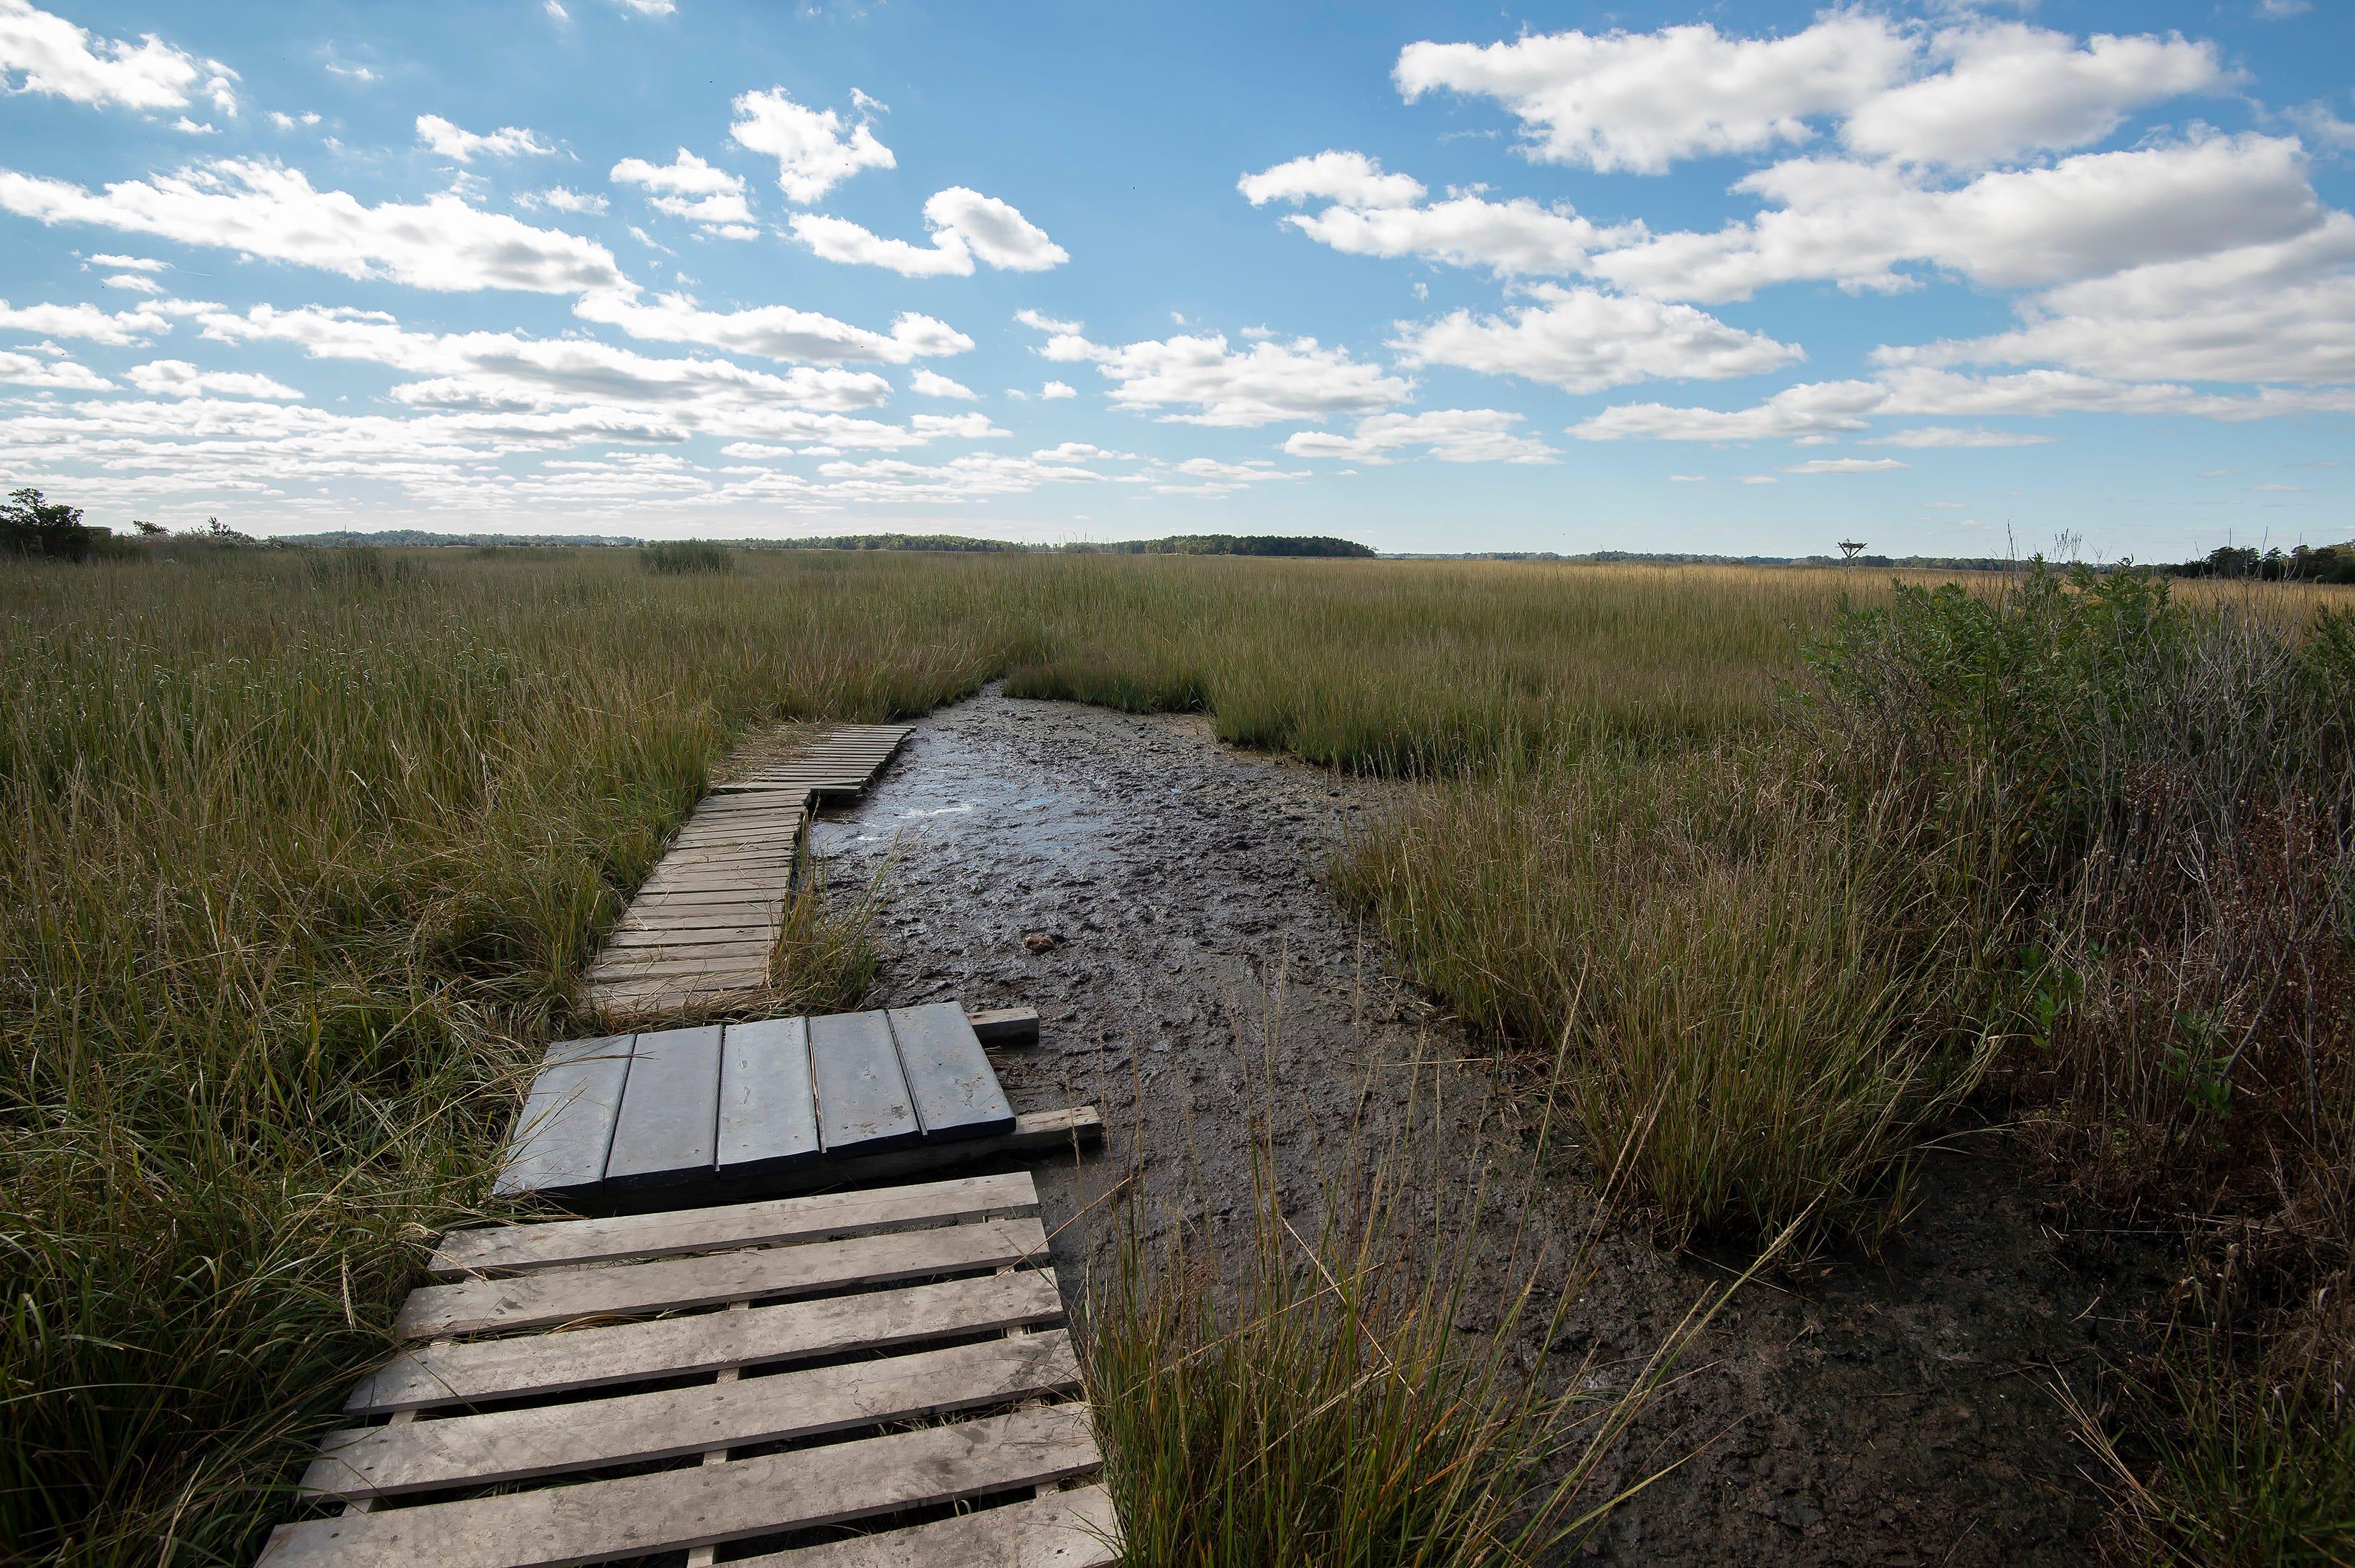 Delaware marsh project lauded as educational tool | Delaware Online